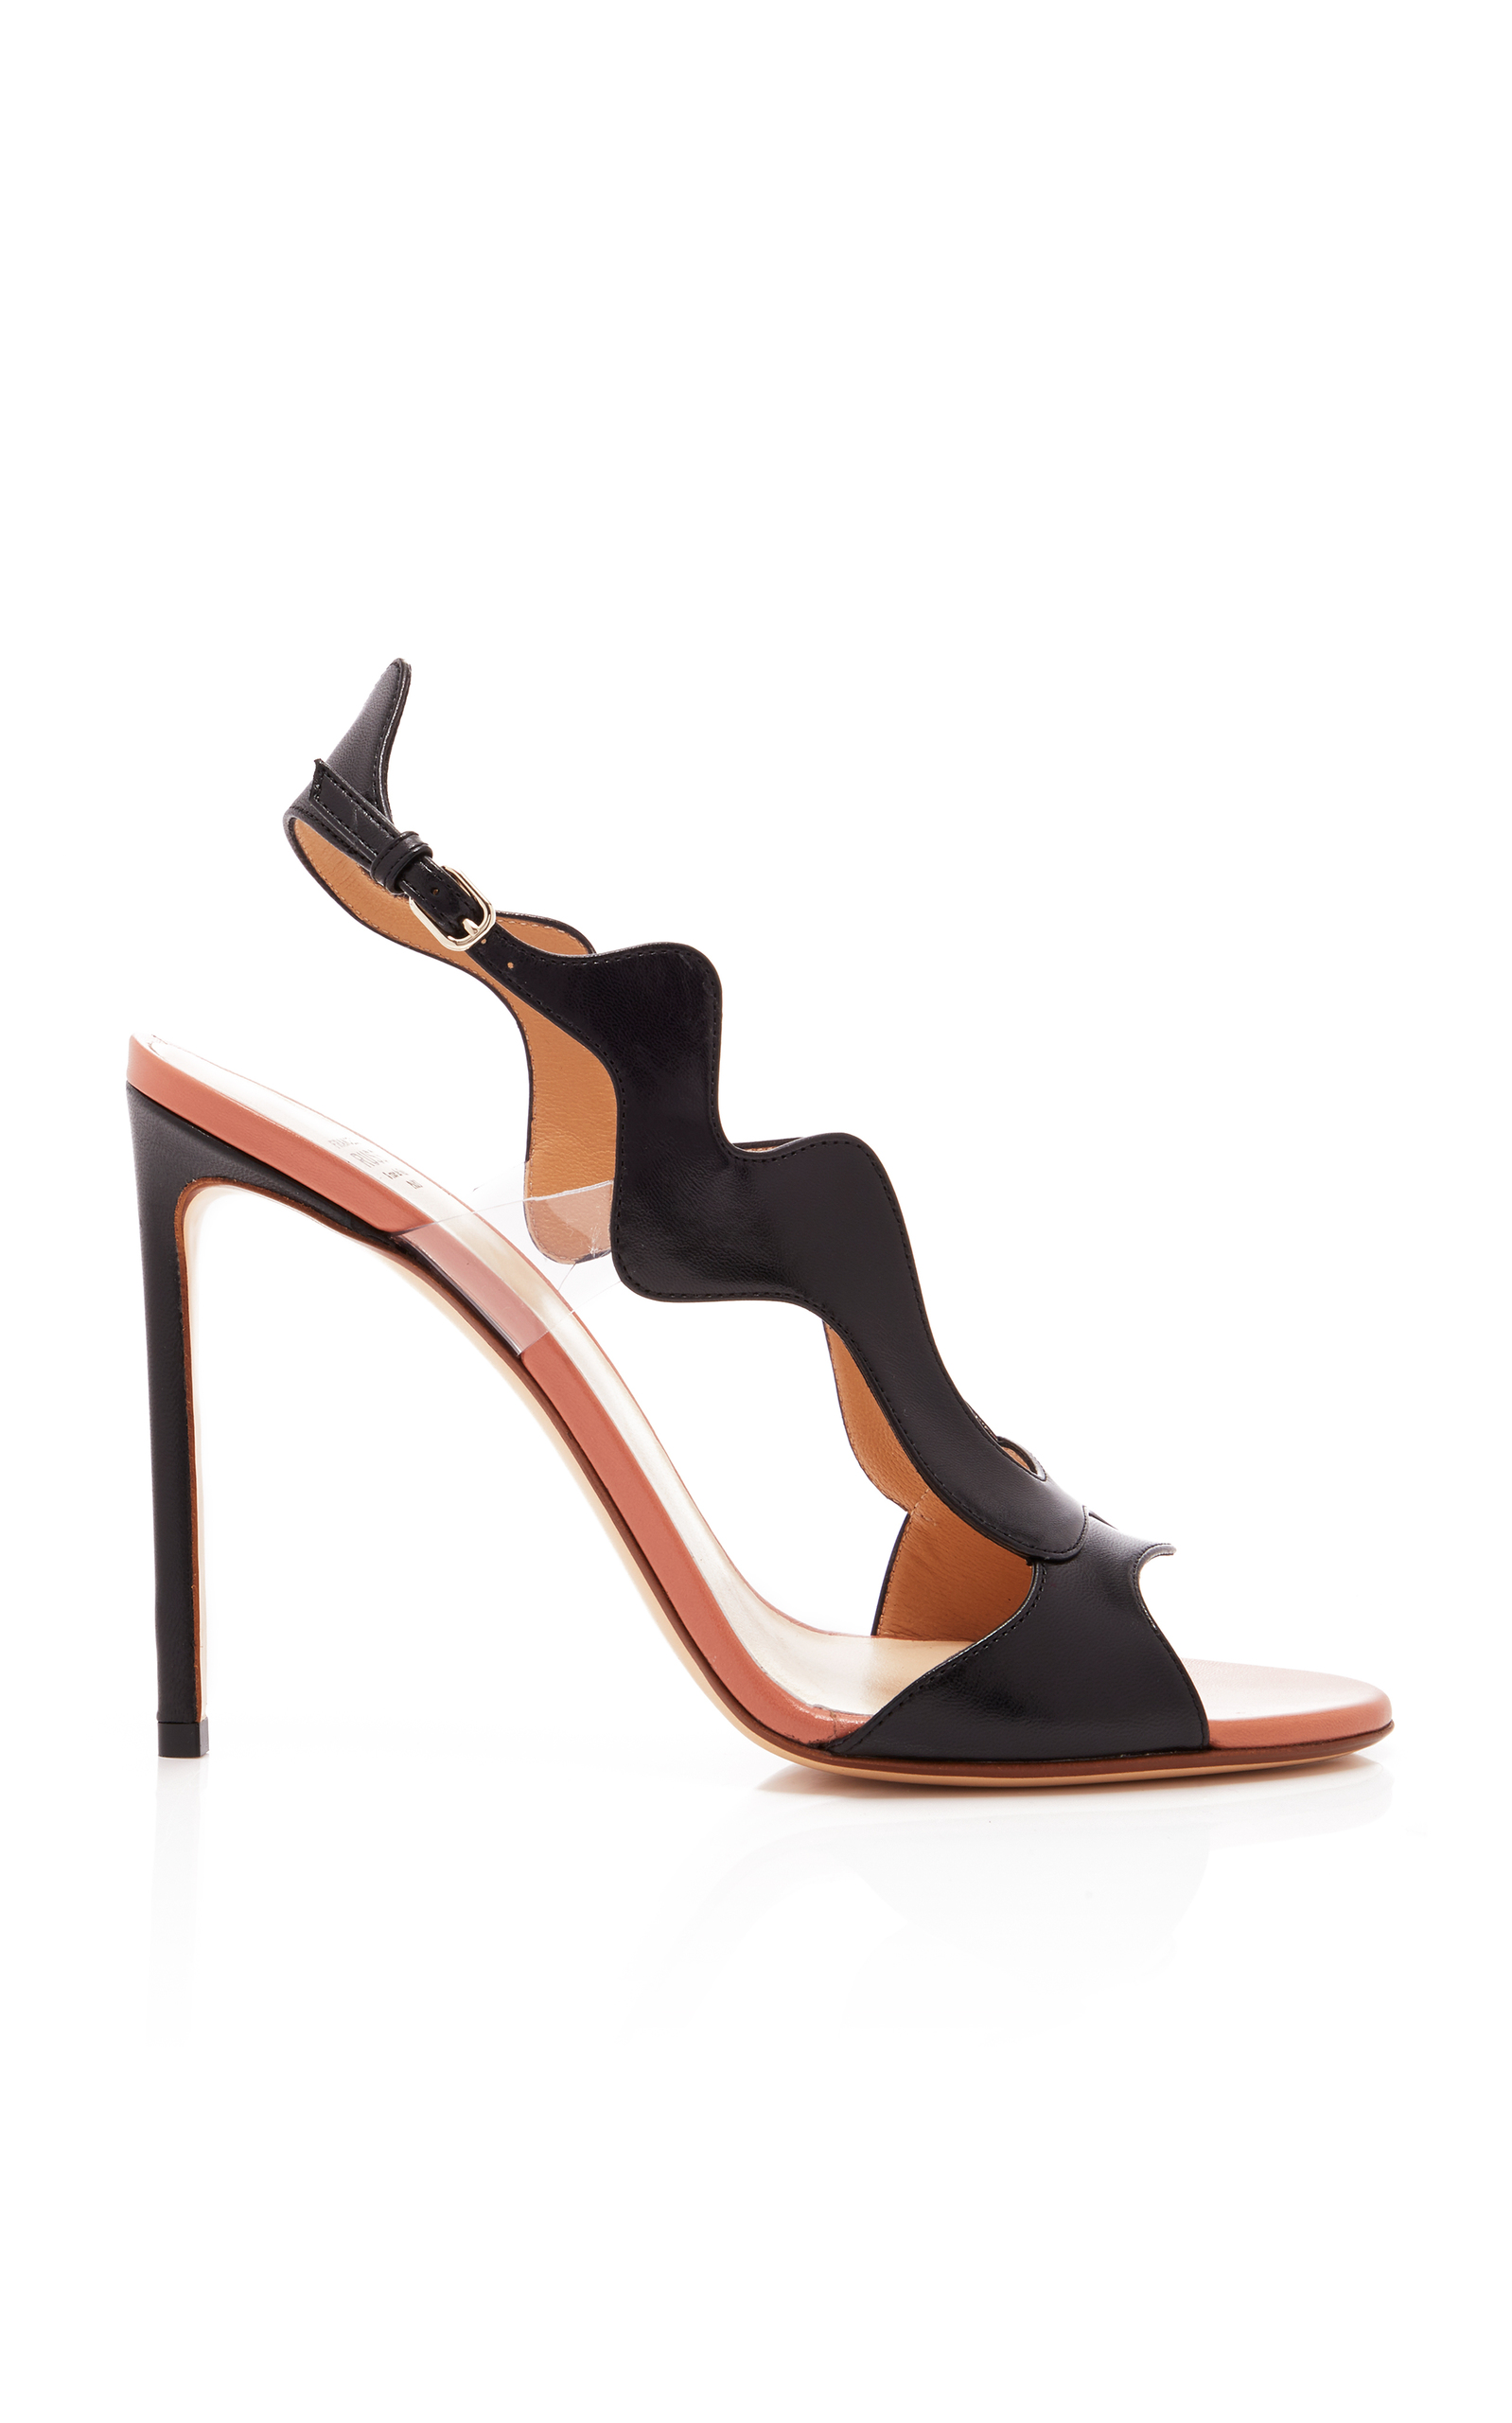 FRANCESCO RUSSO Scalloped Two-Tone Sandal in Black